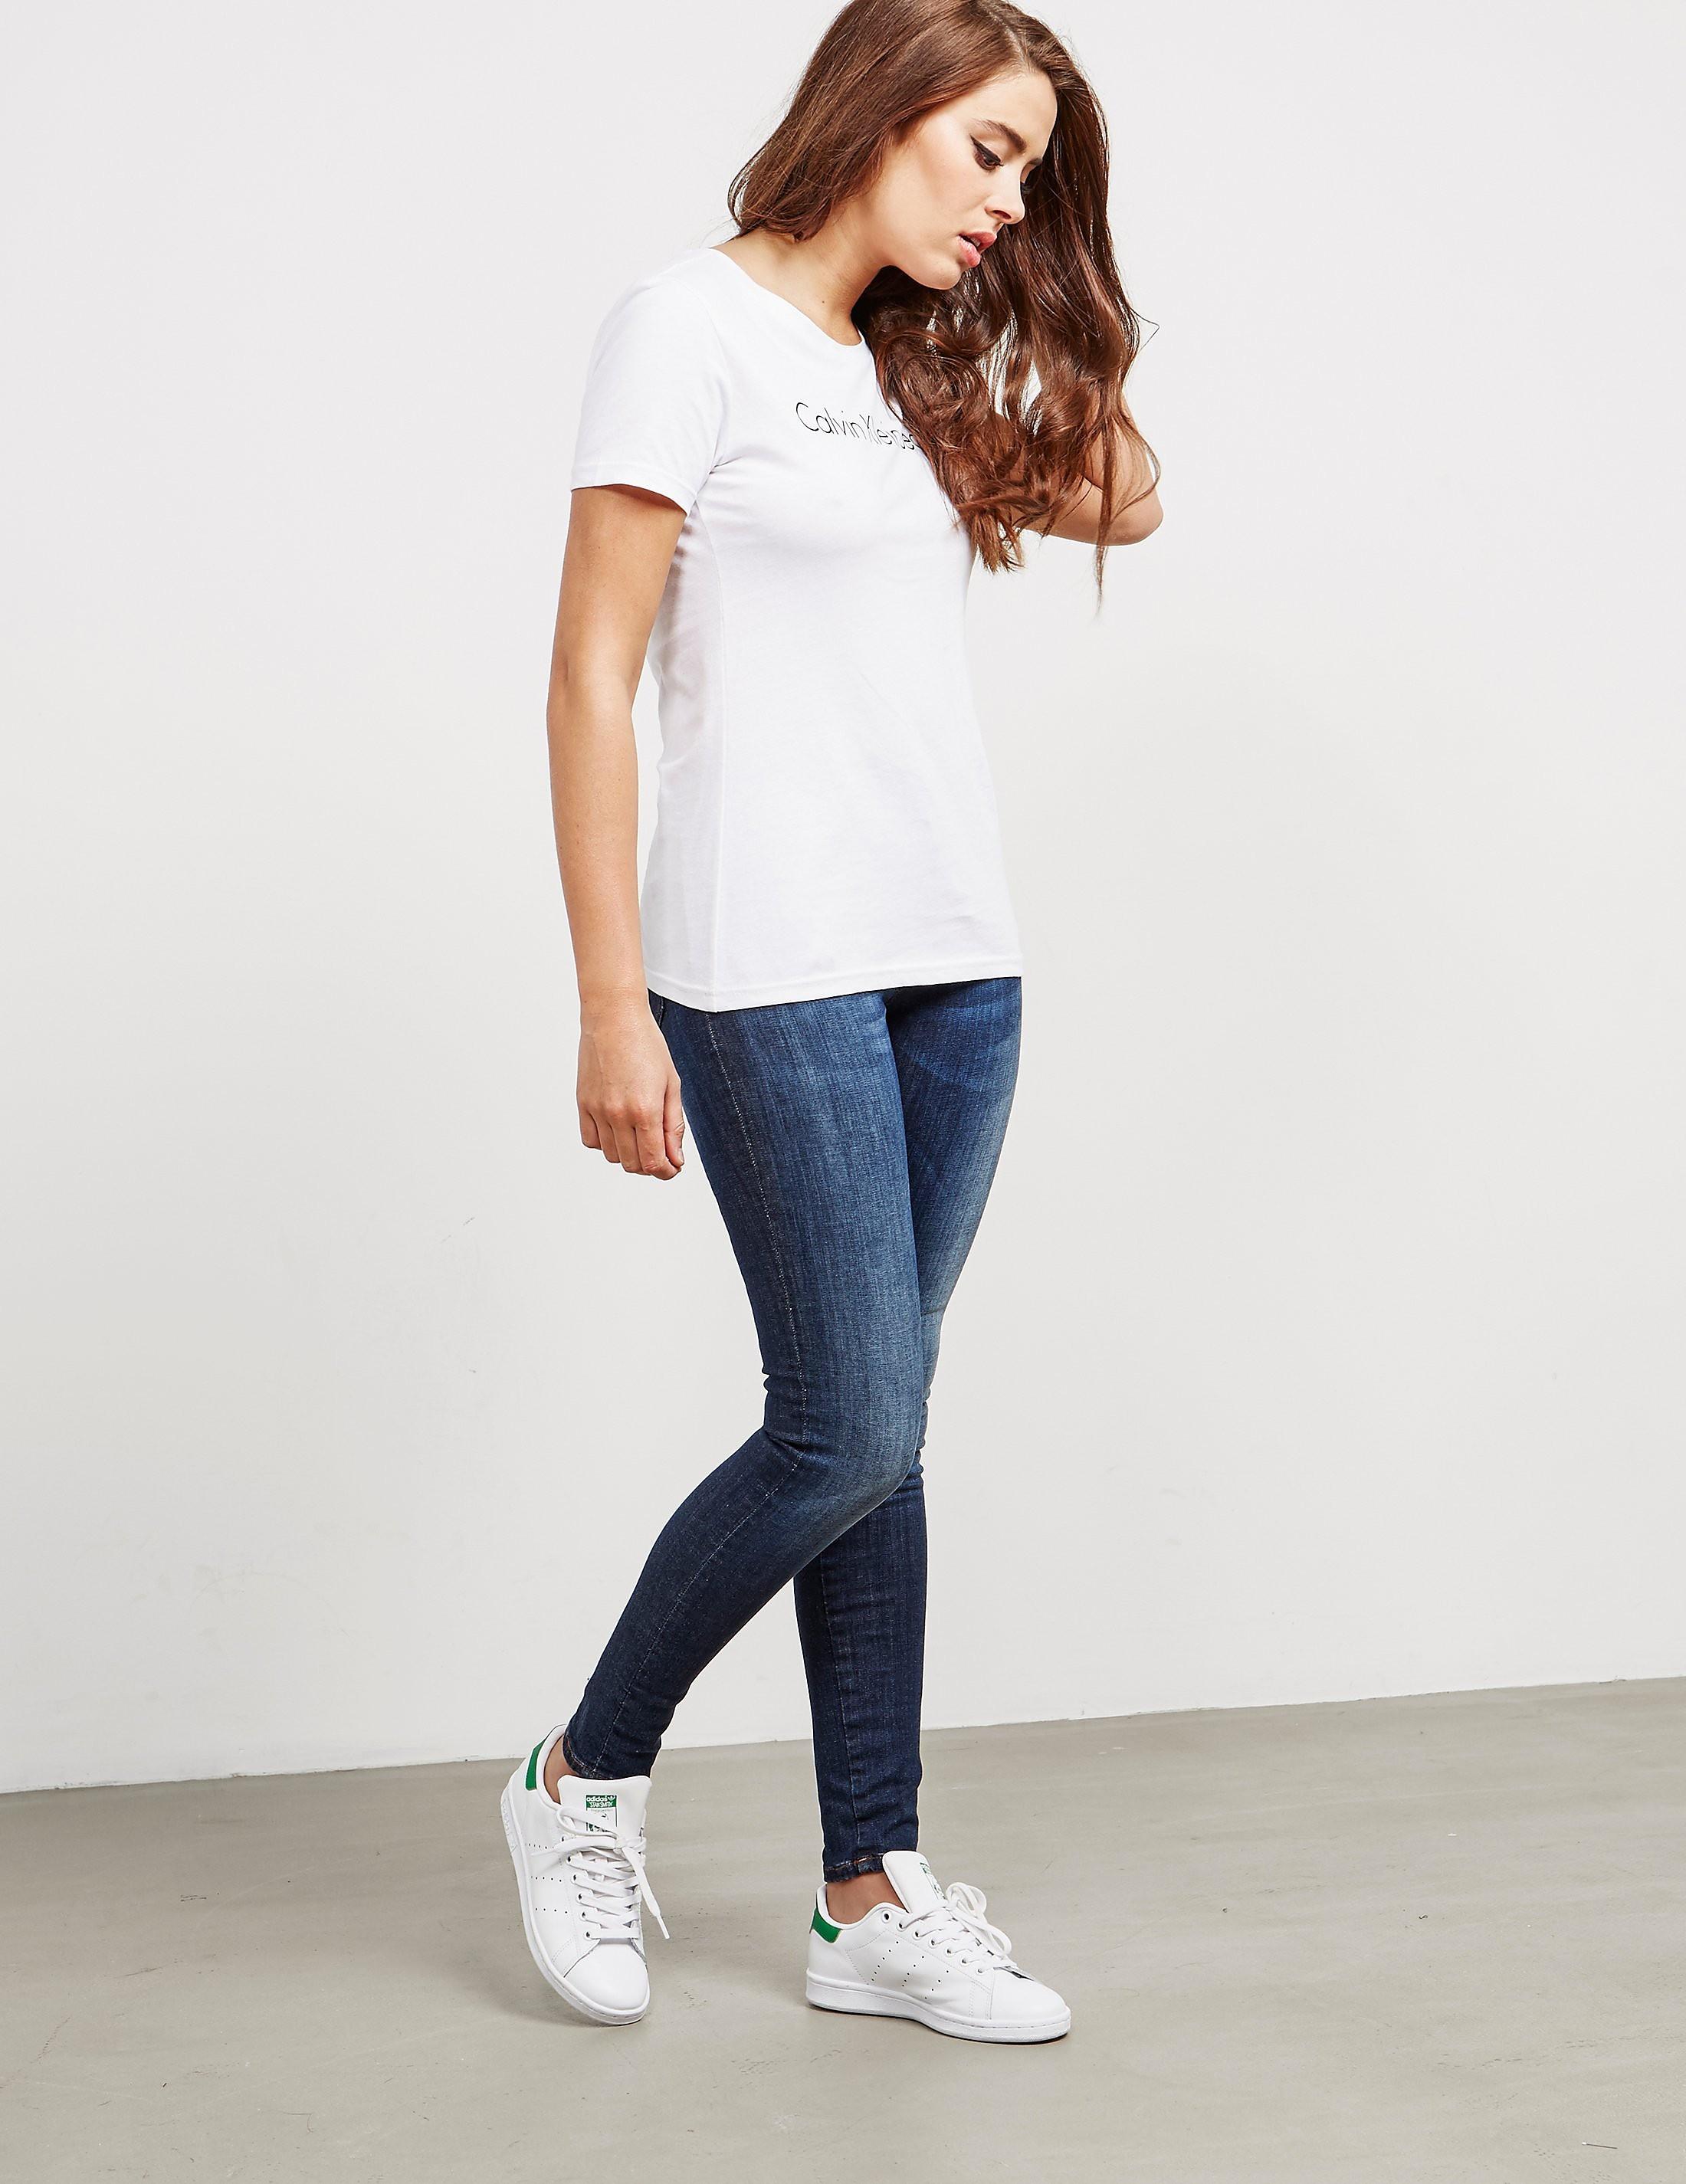 Calvin Klein Tamar 43 Short Sleeve T-Shirt